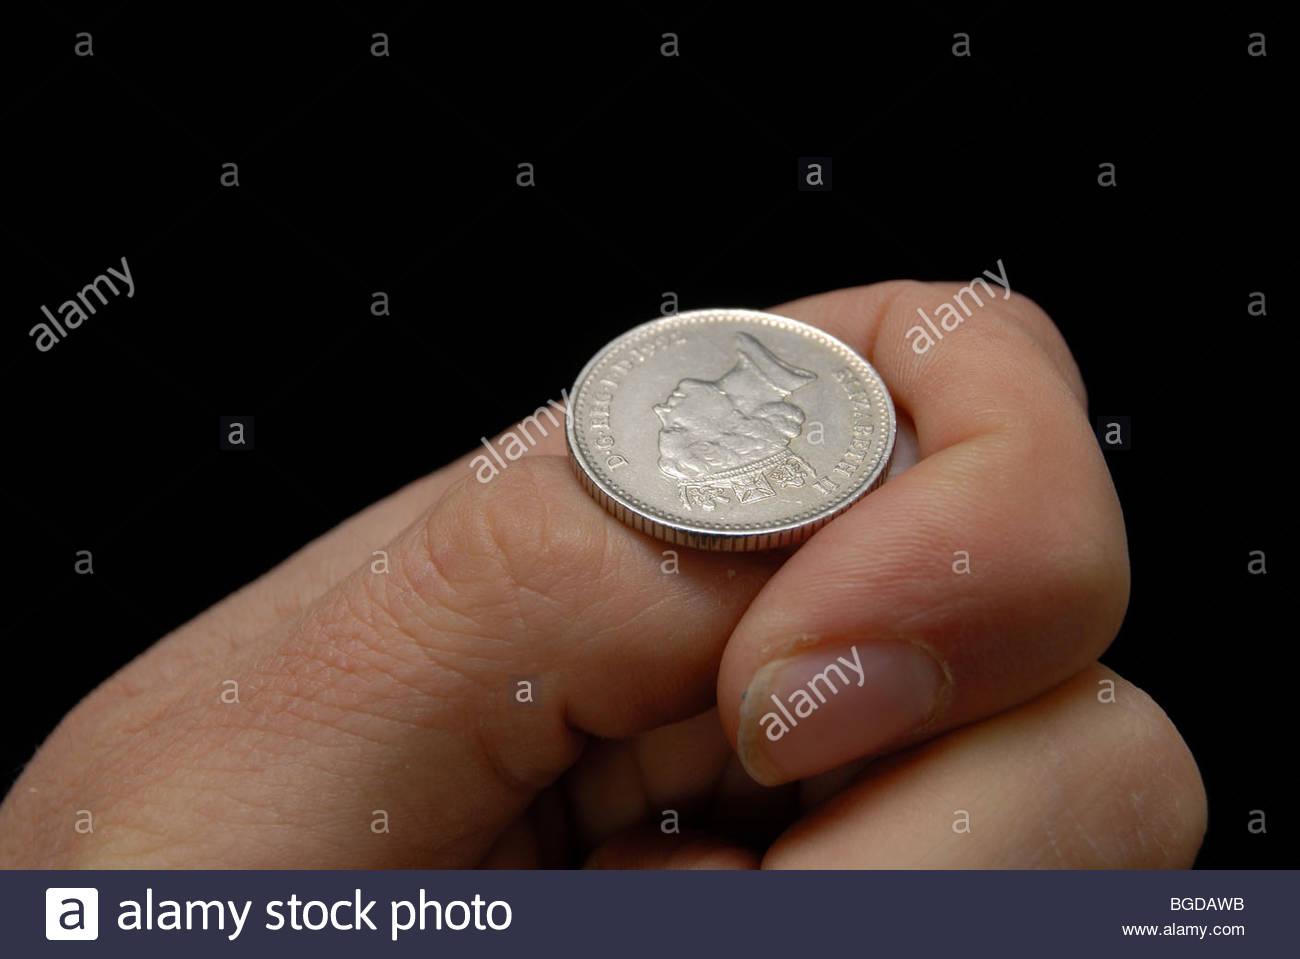 Flipping a ten pence piece coin. - Stock Image